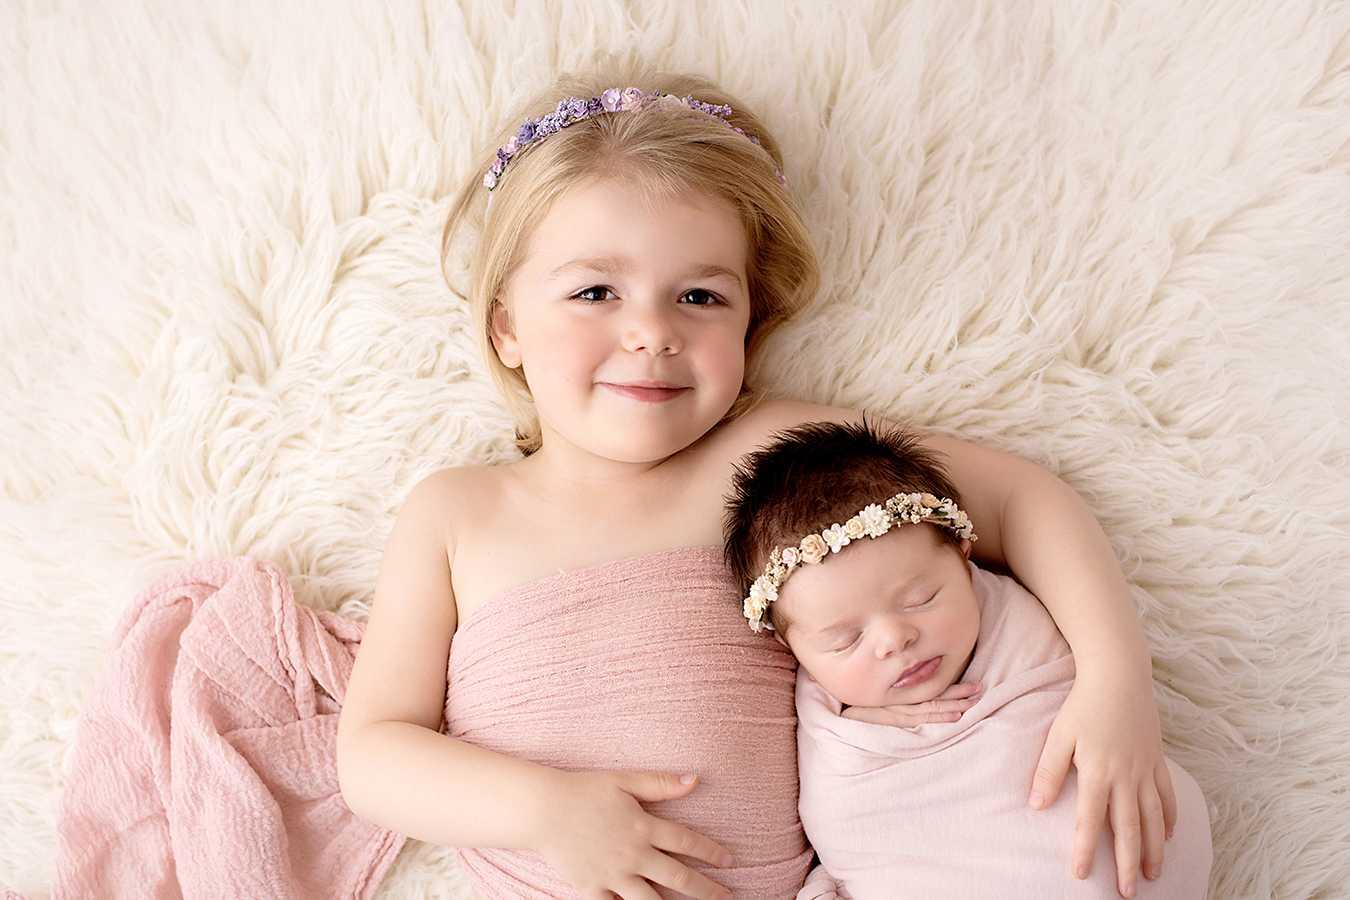 Newborn Baby Photos Stockport